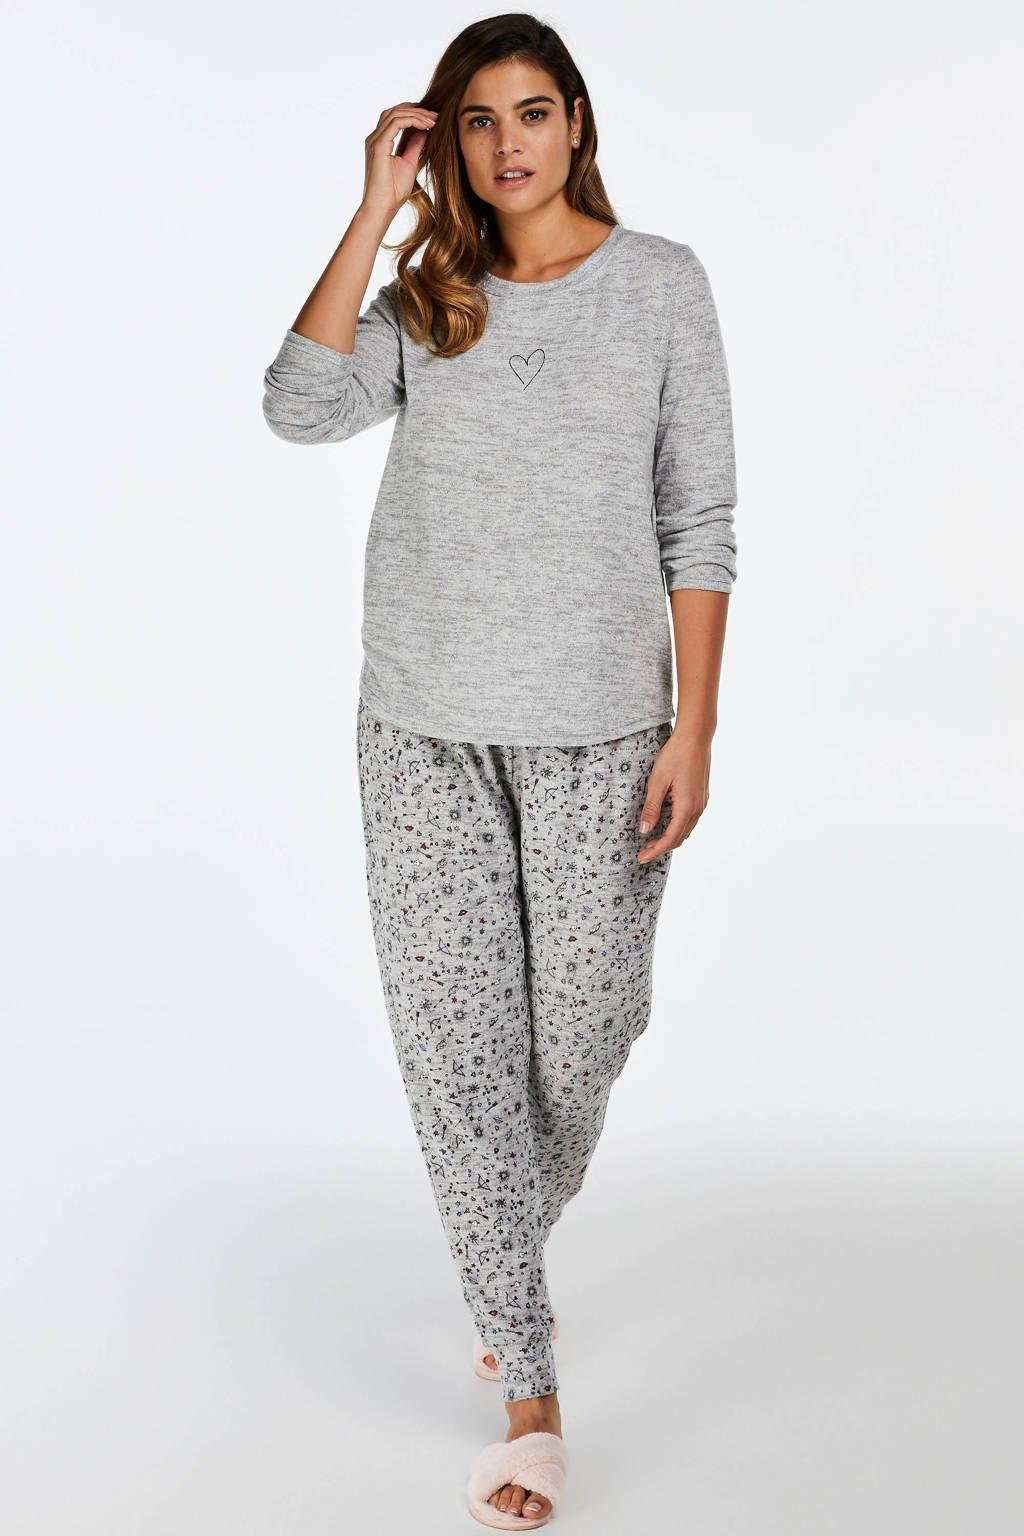 Hunkemöller pyjama met printopdruk grijs, Grijs